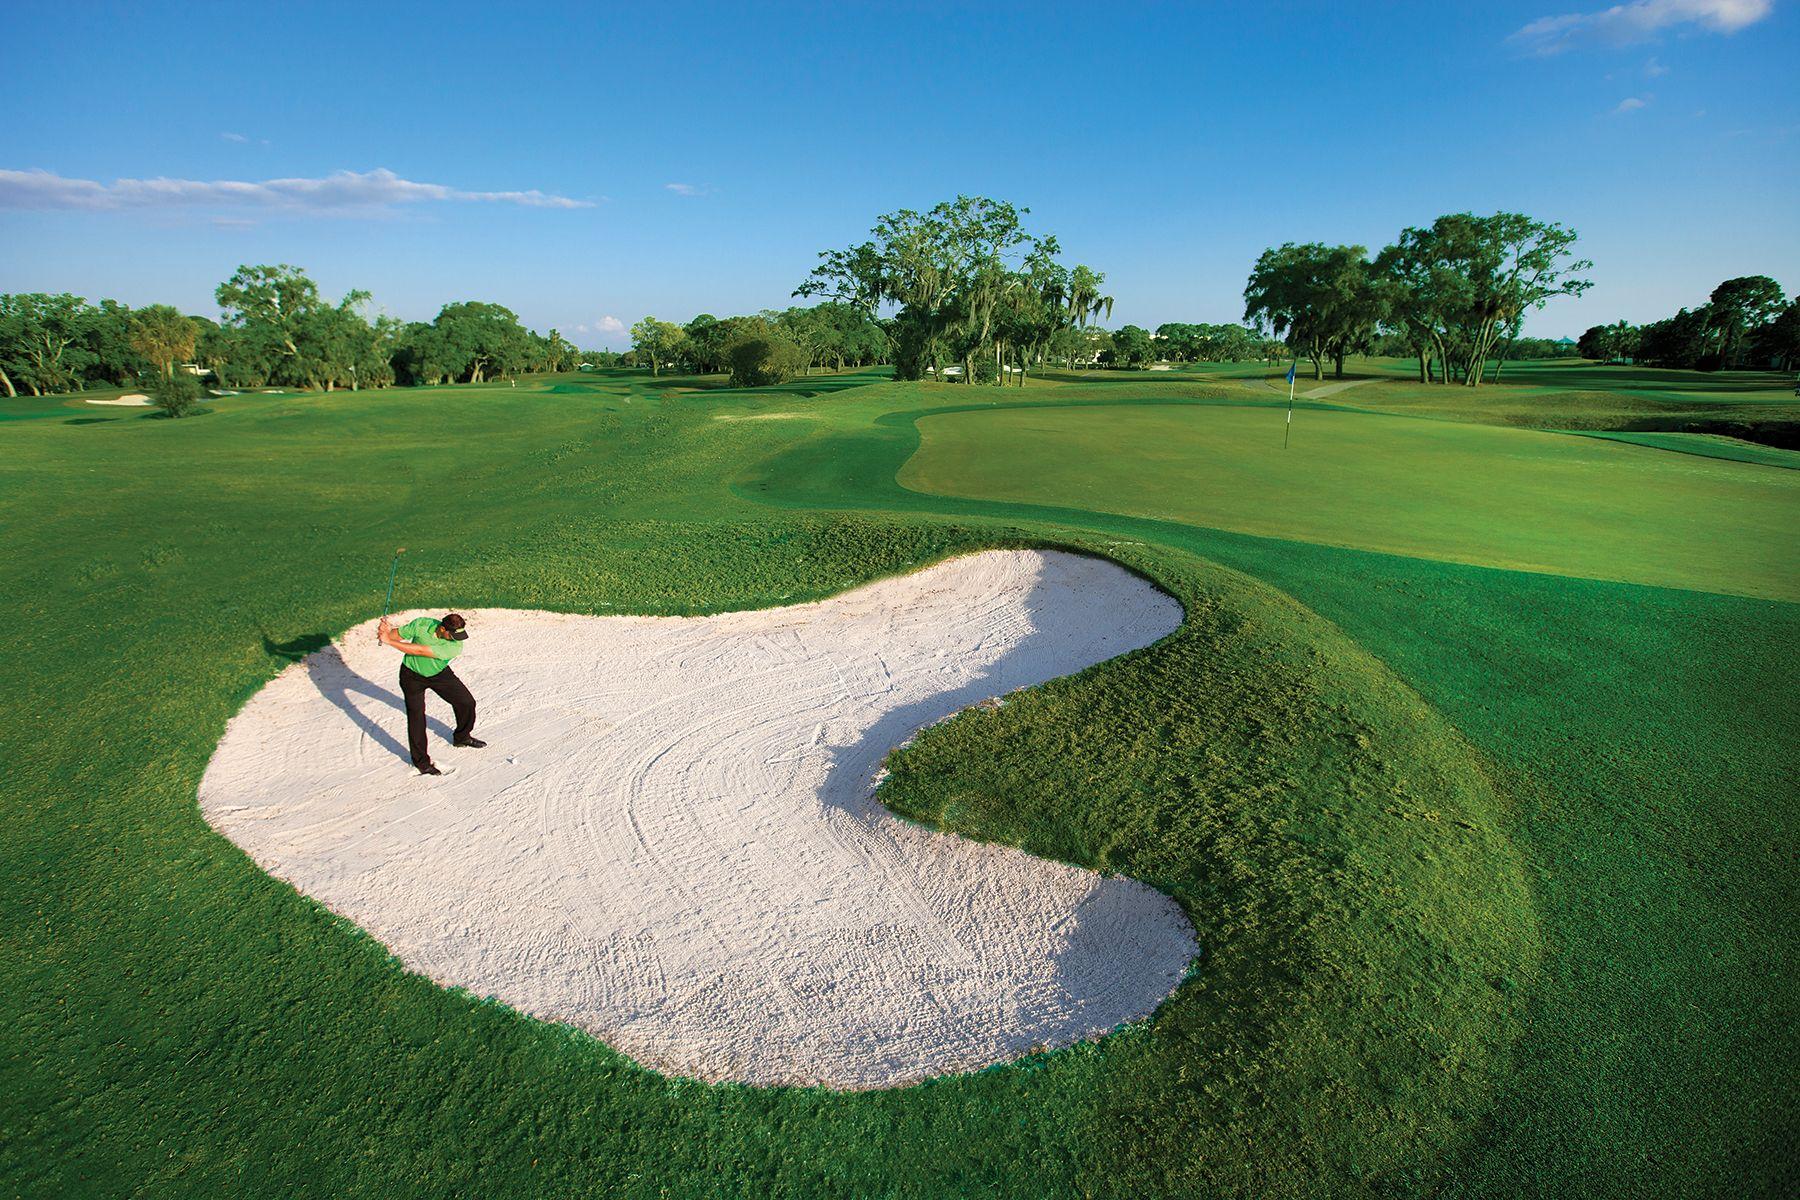 Golf Course At Img Academy Golf Club Bradenton Fl Playgolfsarasota Golf Play Golf Img Academy